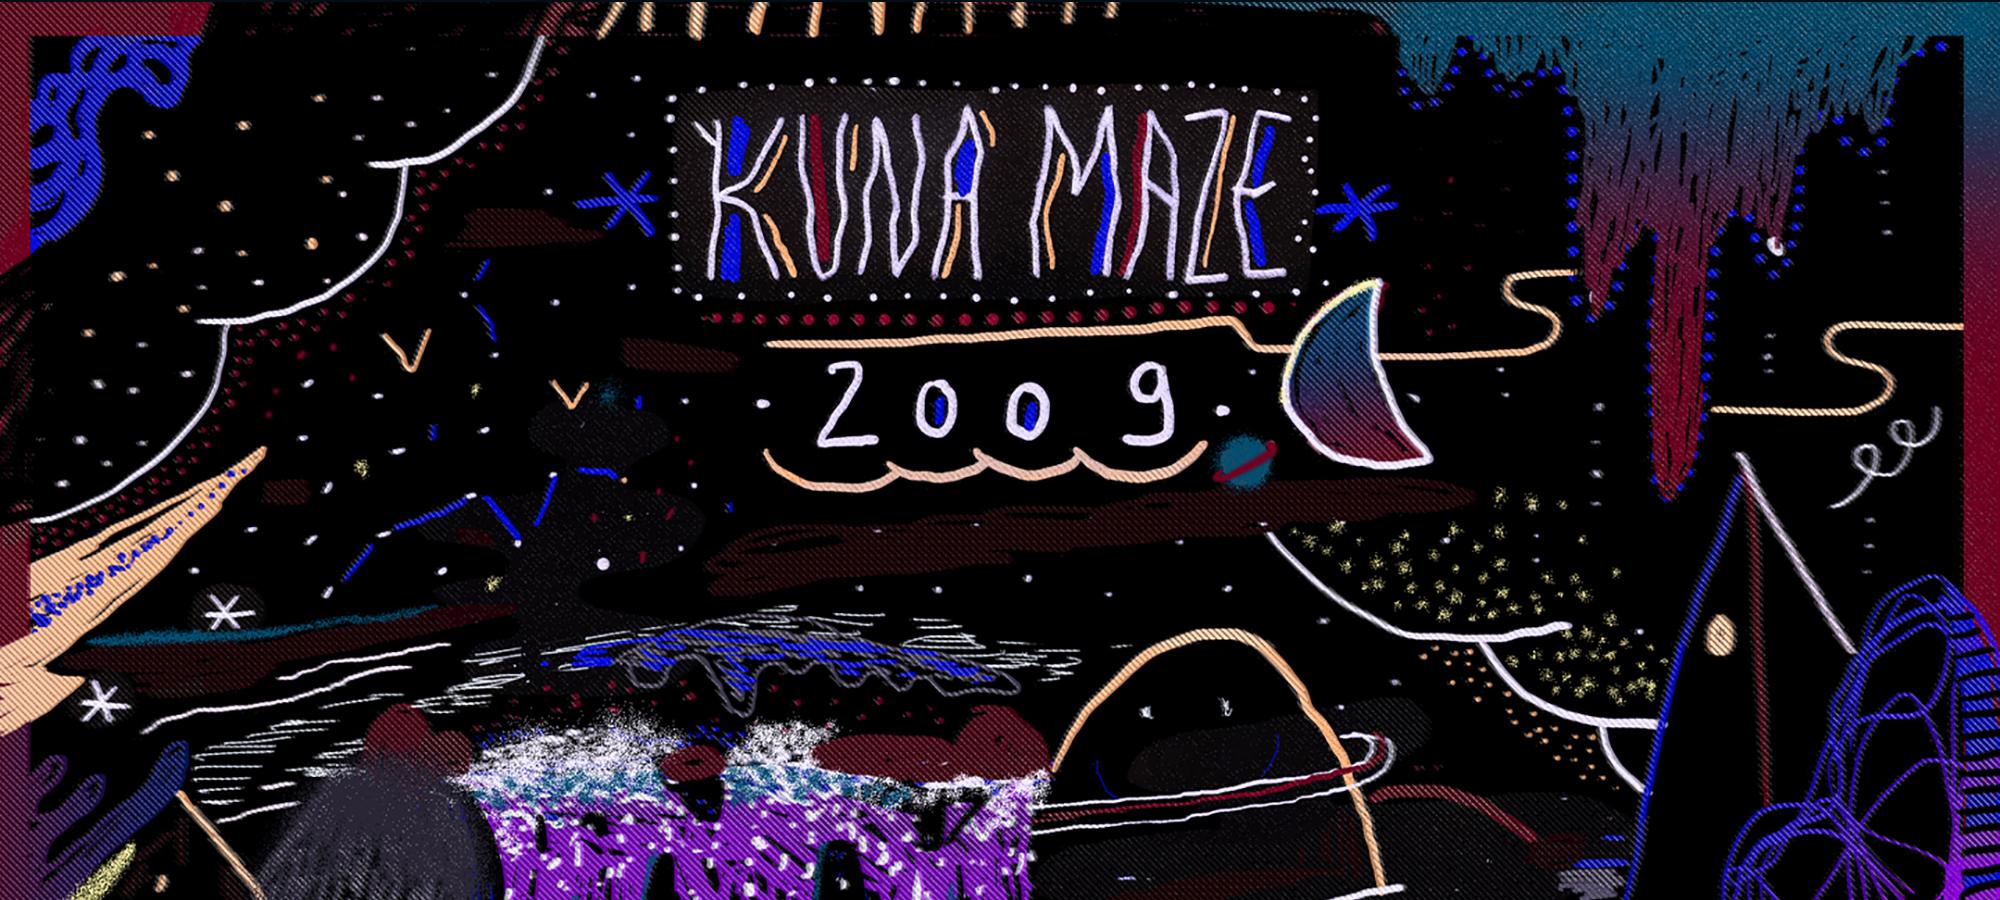 Kuna Maze new EP 2009 - chill electronic music downtempo